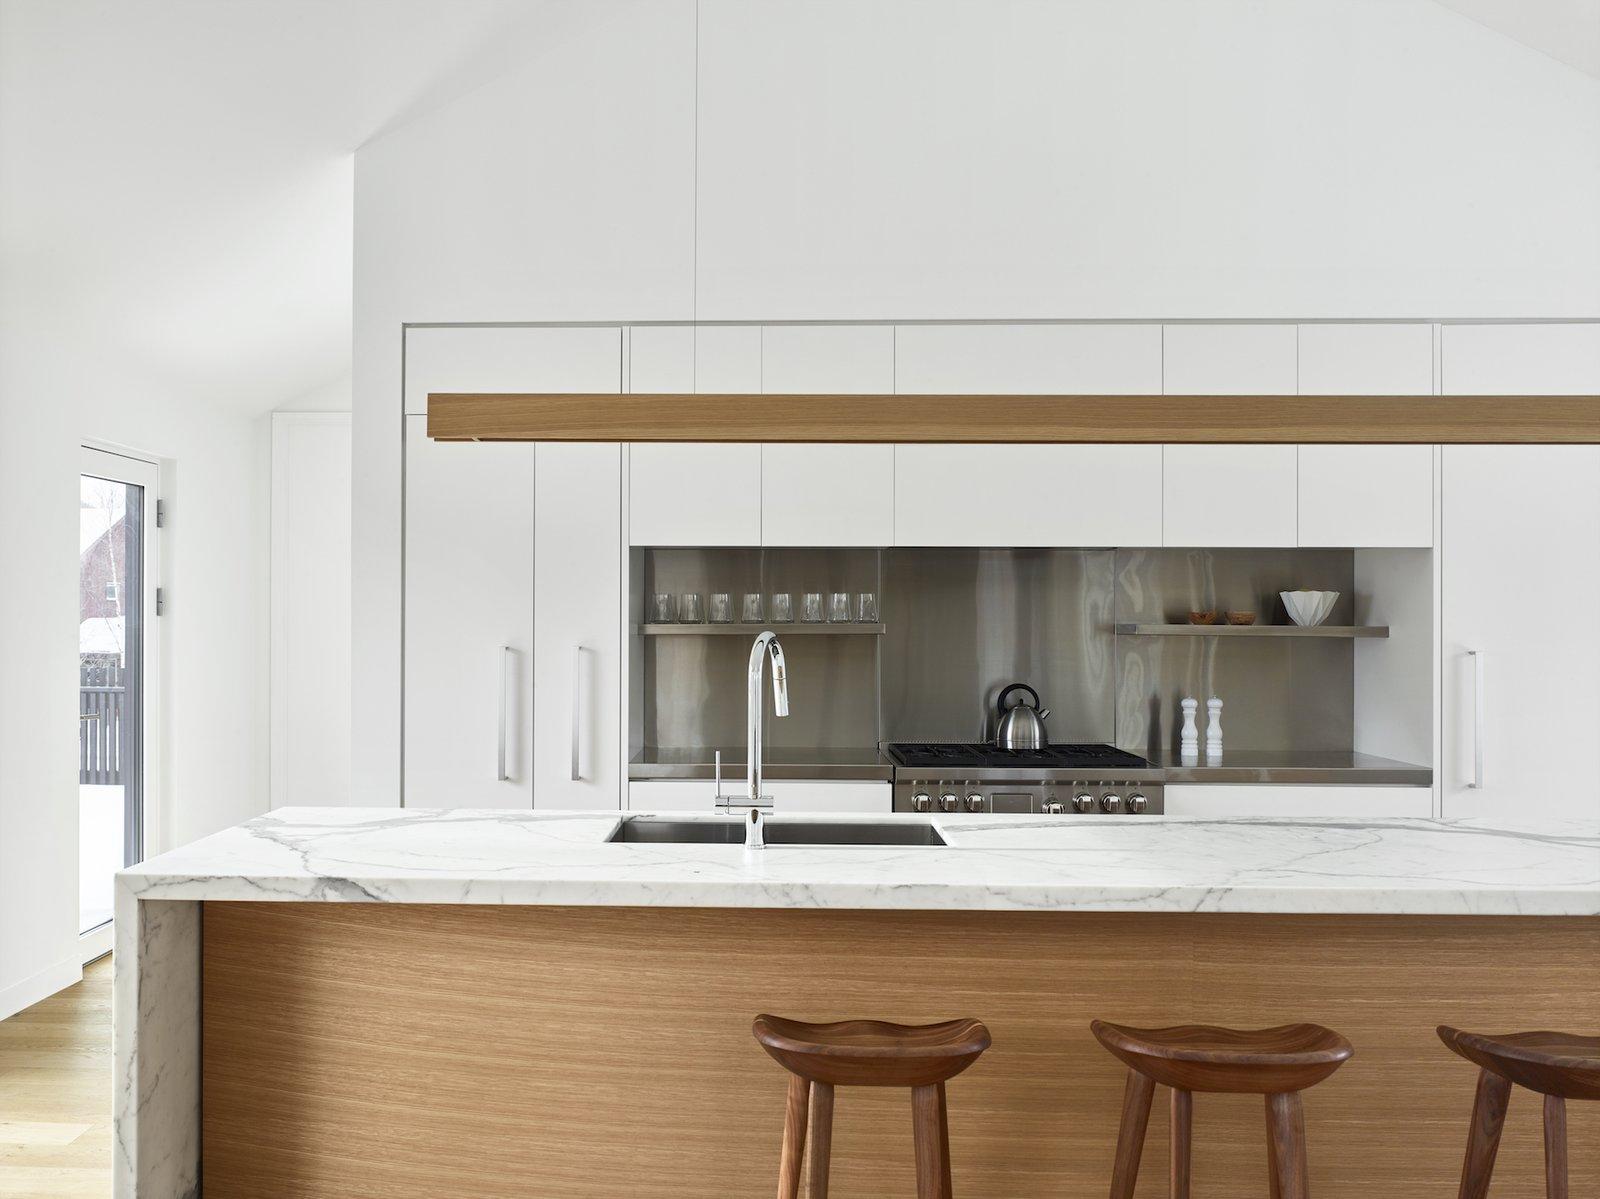 Kitchen, Marble Counter, Light Hardwood Floor, Track Lighting, Range, White Cabinet, Metal Backsplashe, and Undermount Sink  Alta Chalet